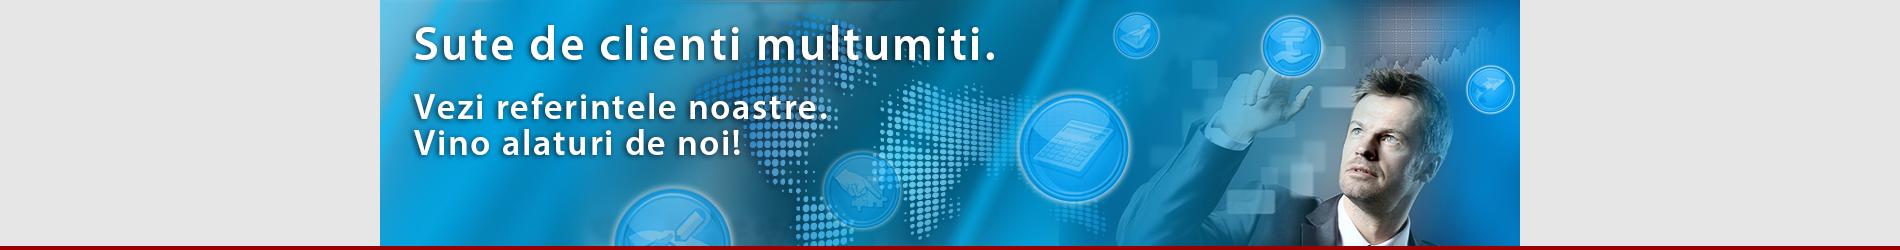 banner_site_clienti